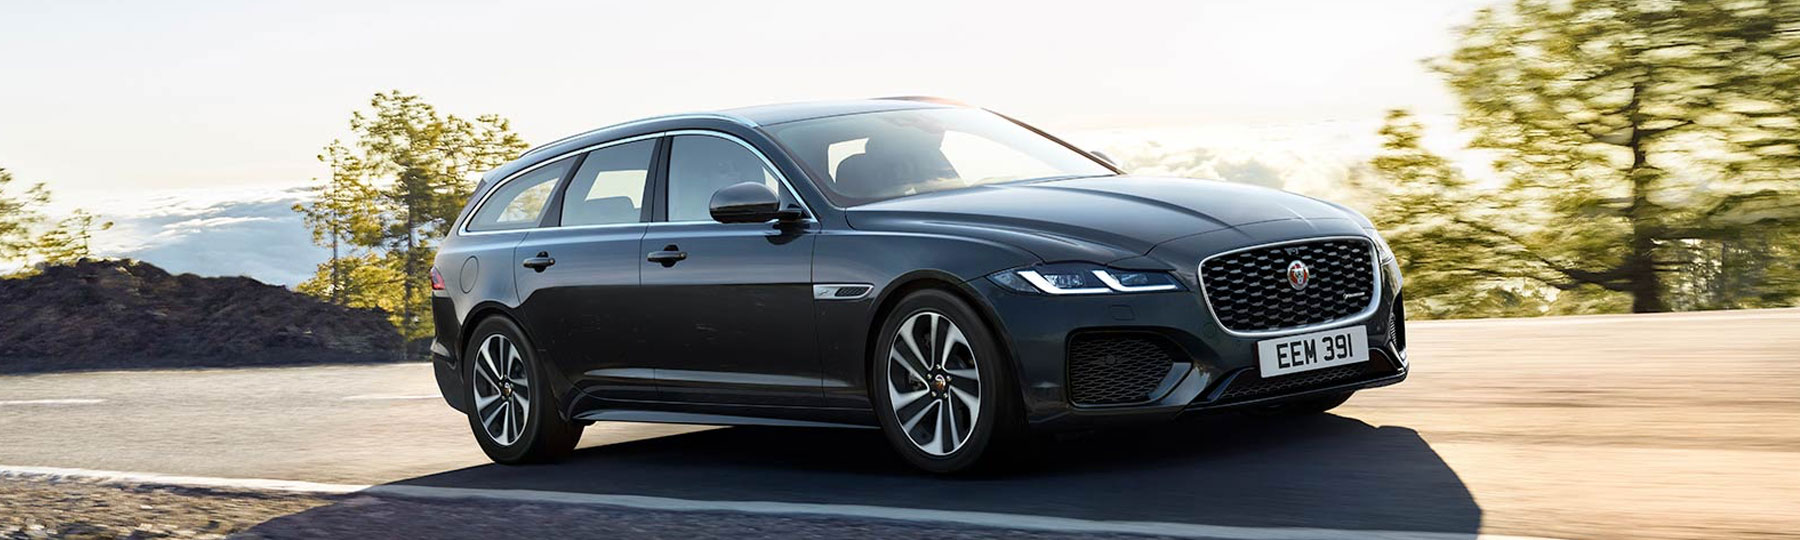 New Jaguar XF Sportbrake Business Offer